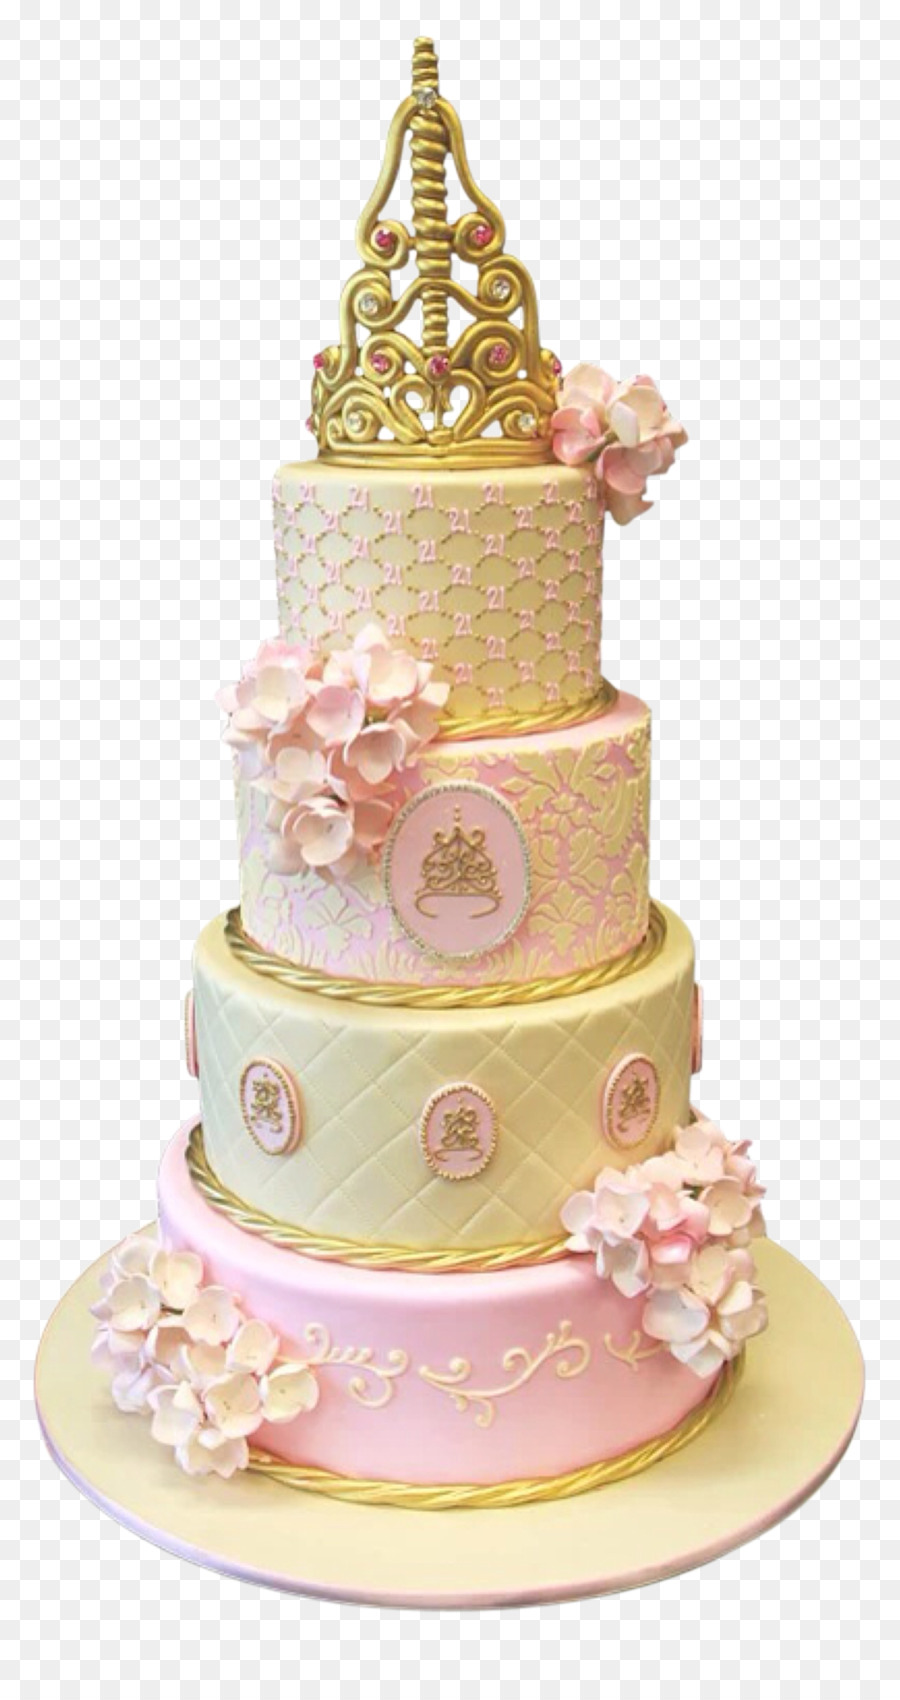 Birthday cake Princess cake Cupcake Wedding cake Icing Cake